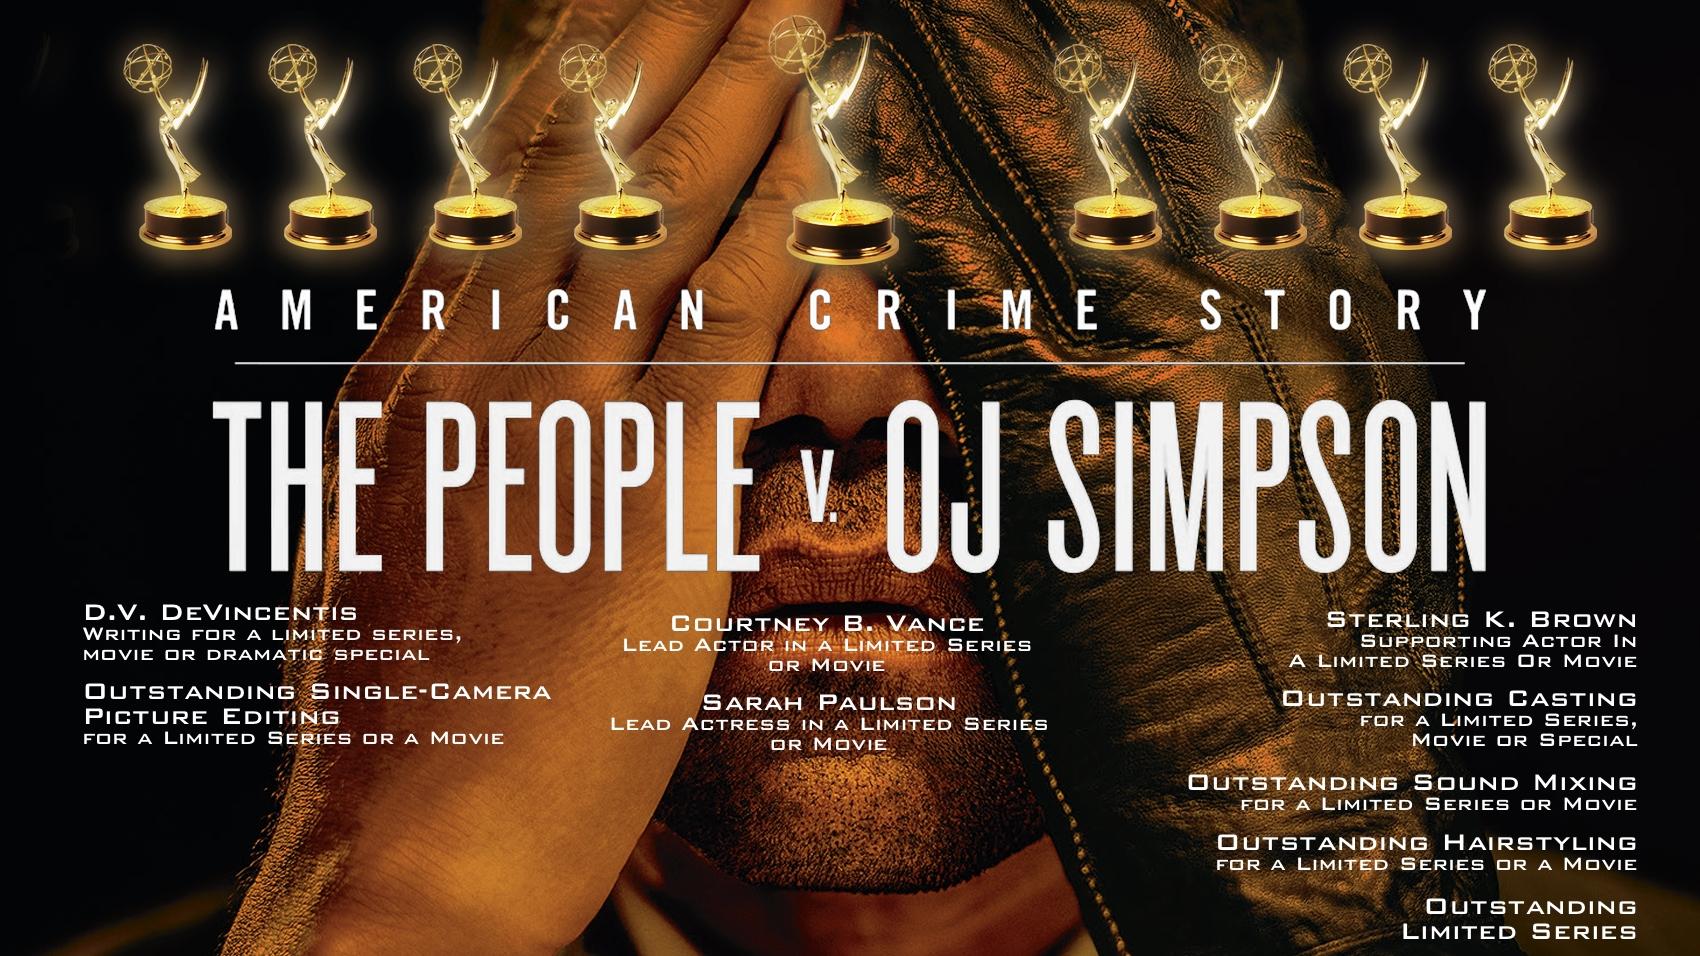 Banner-The-People-vs-OJ-Simpsons